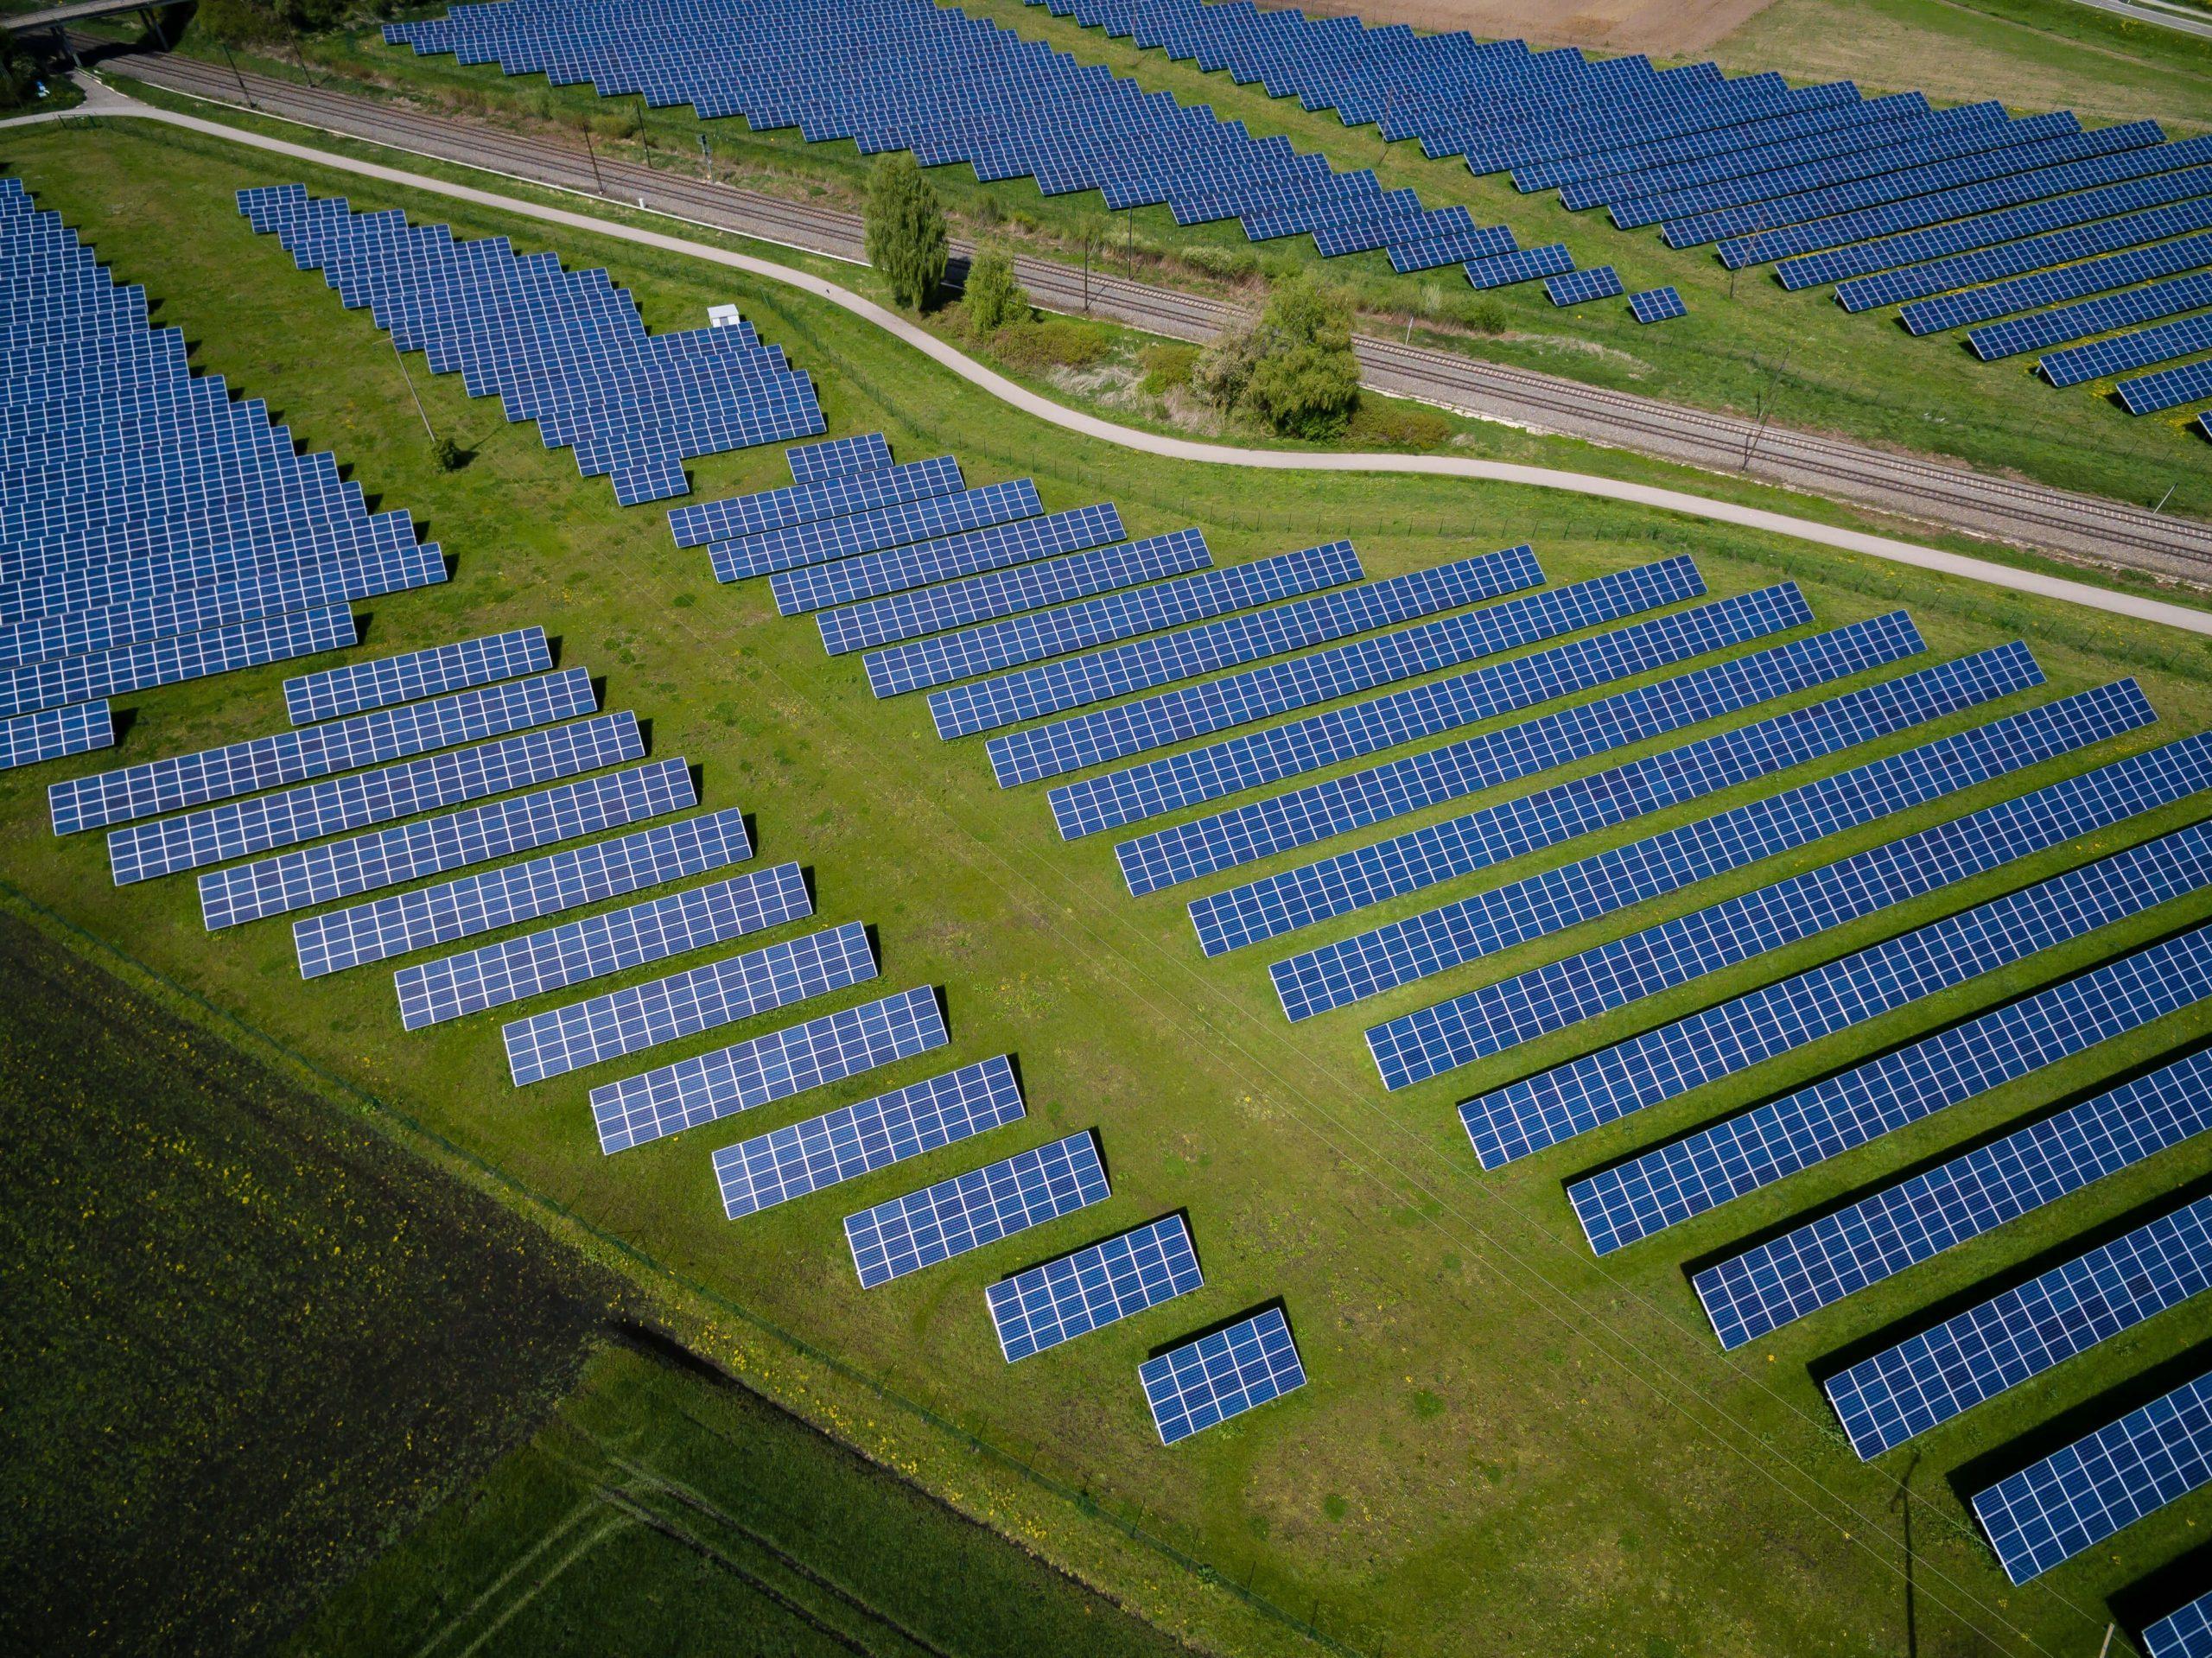 Solar panels in a field. Solar company names